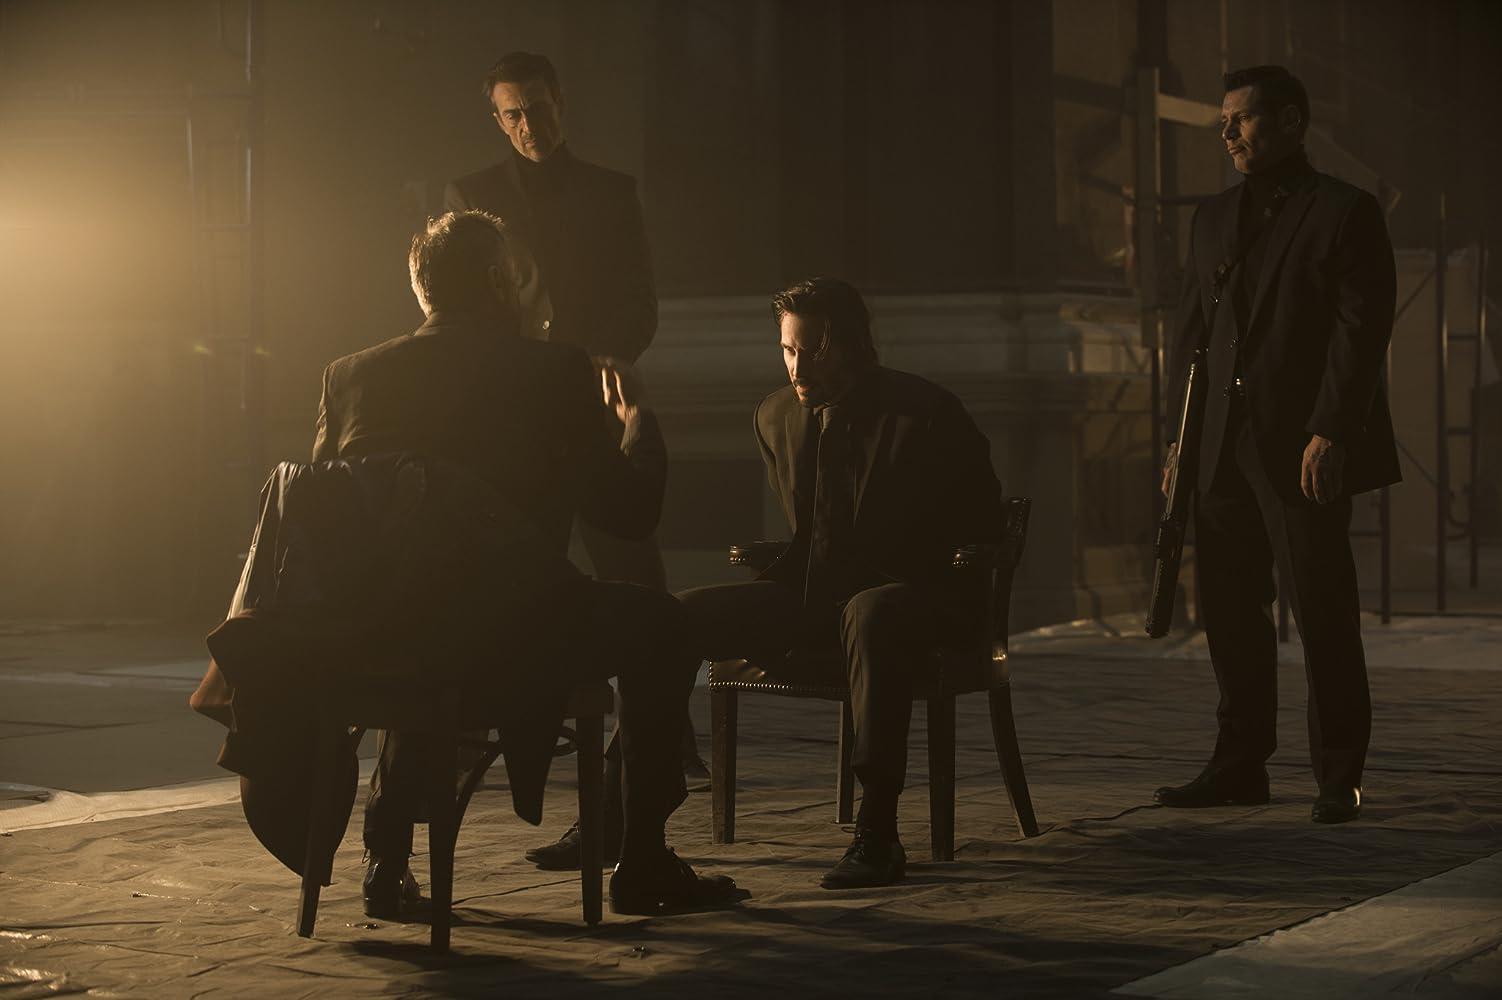 Keanu Reeves, Daniel Bernhardt, Michael Nyqvist, and Vladislav Koulikov in John Wick (2014)